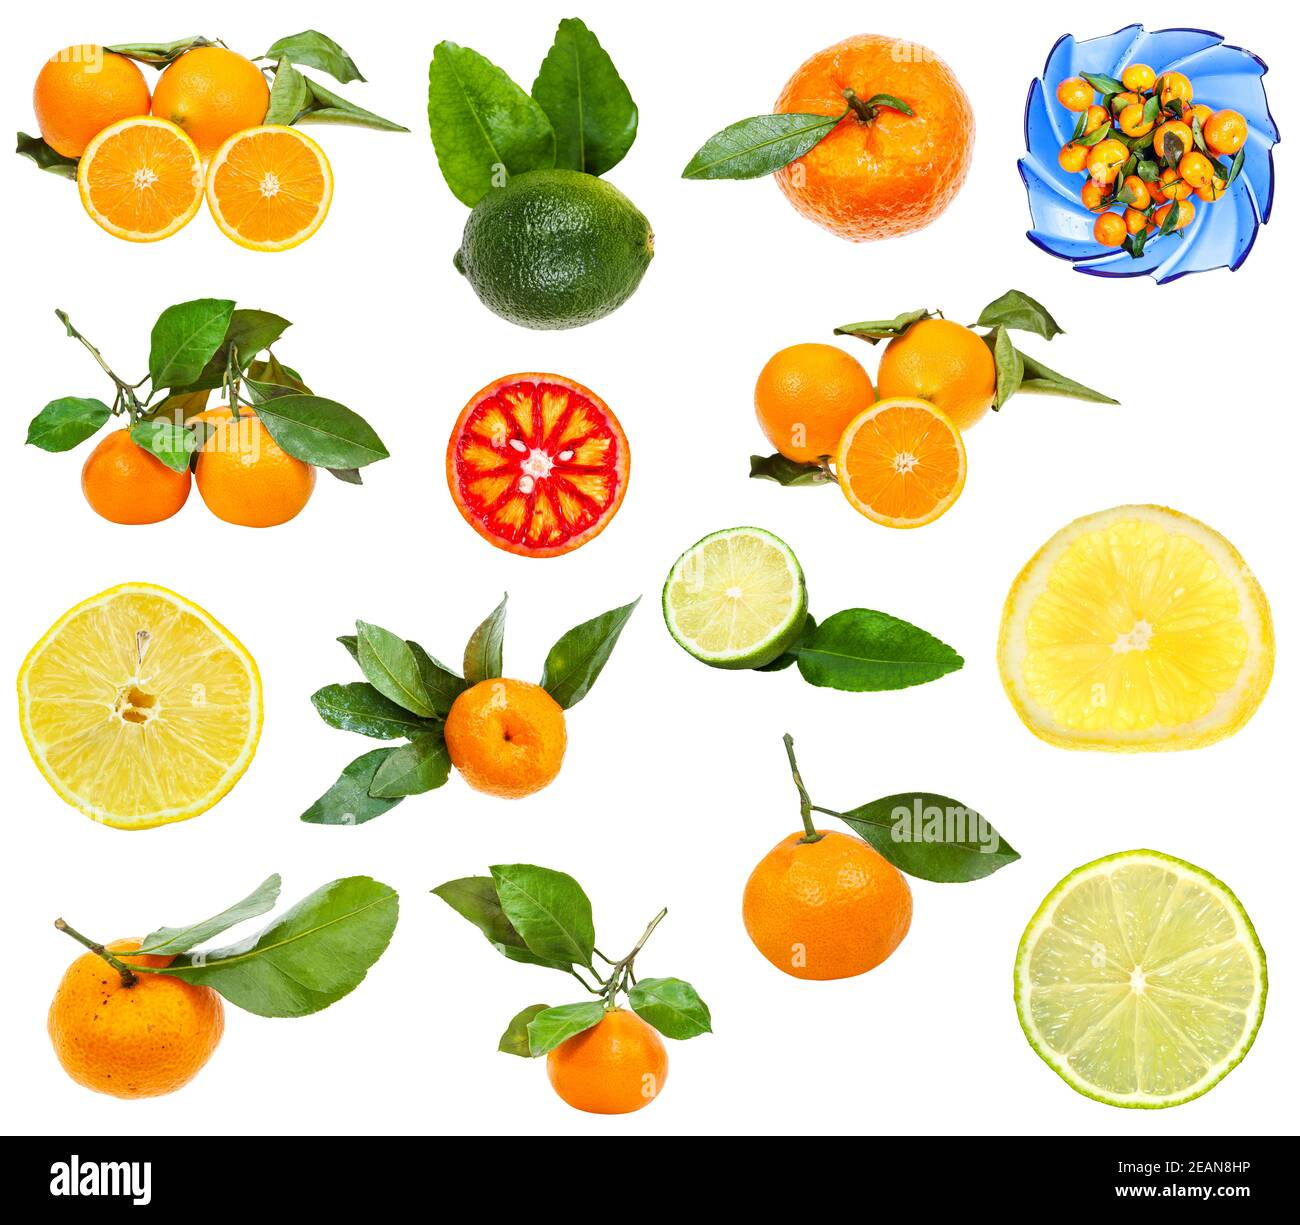 set of various citrus fruits isolated on white Stock Photo